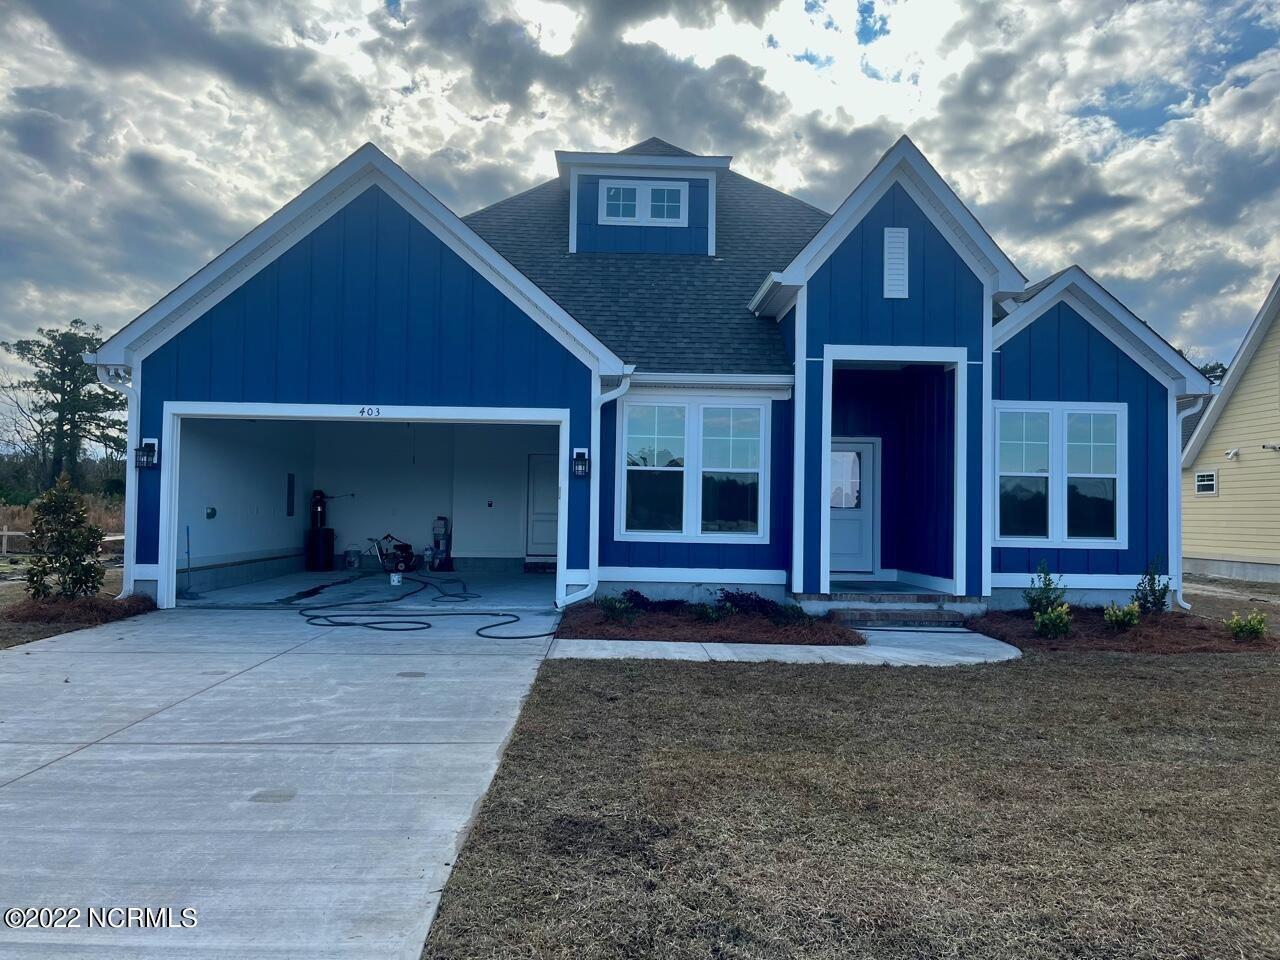 Photo of 403 Taylorwood Drive, Beaufort, NC 28516 (MLS # 100270555)